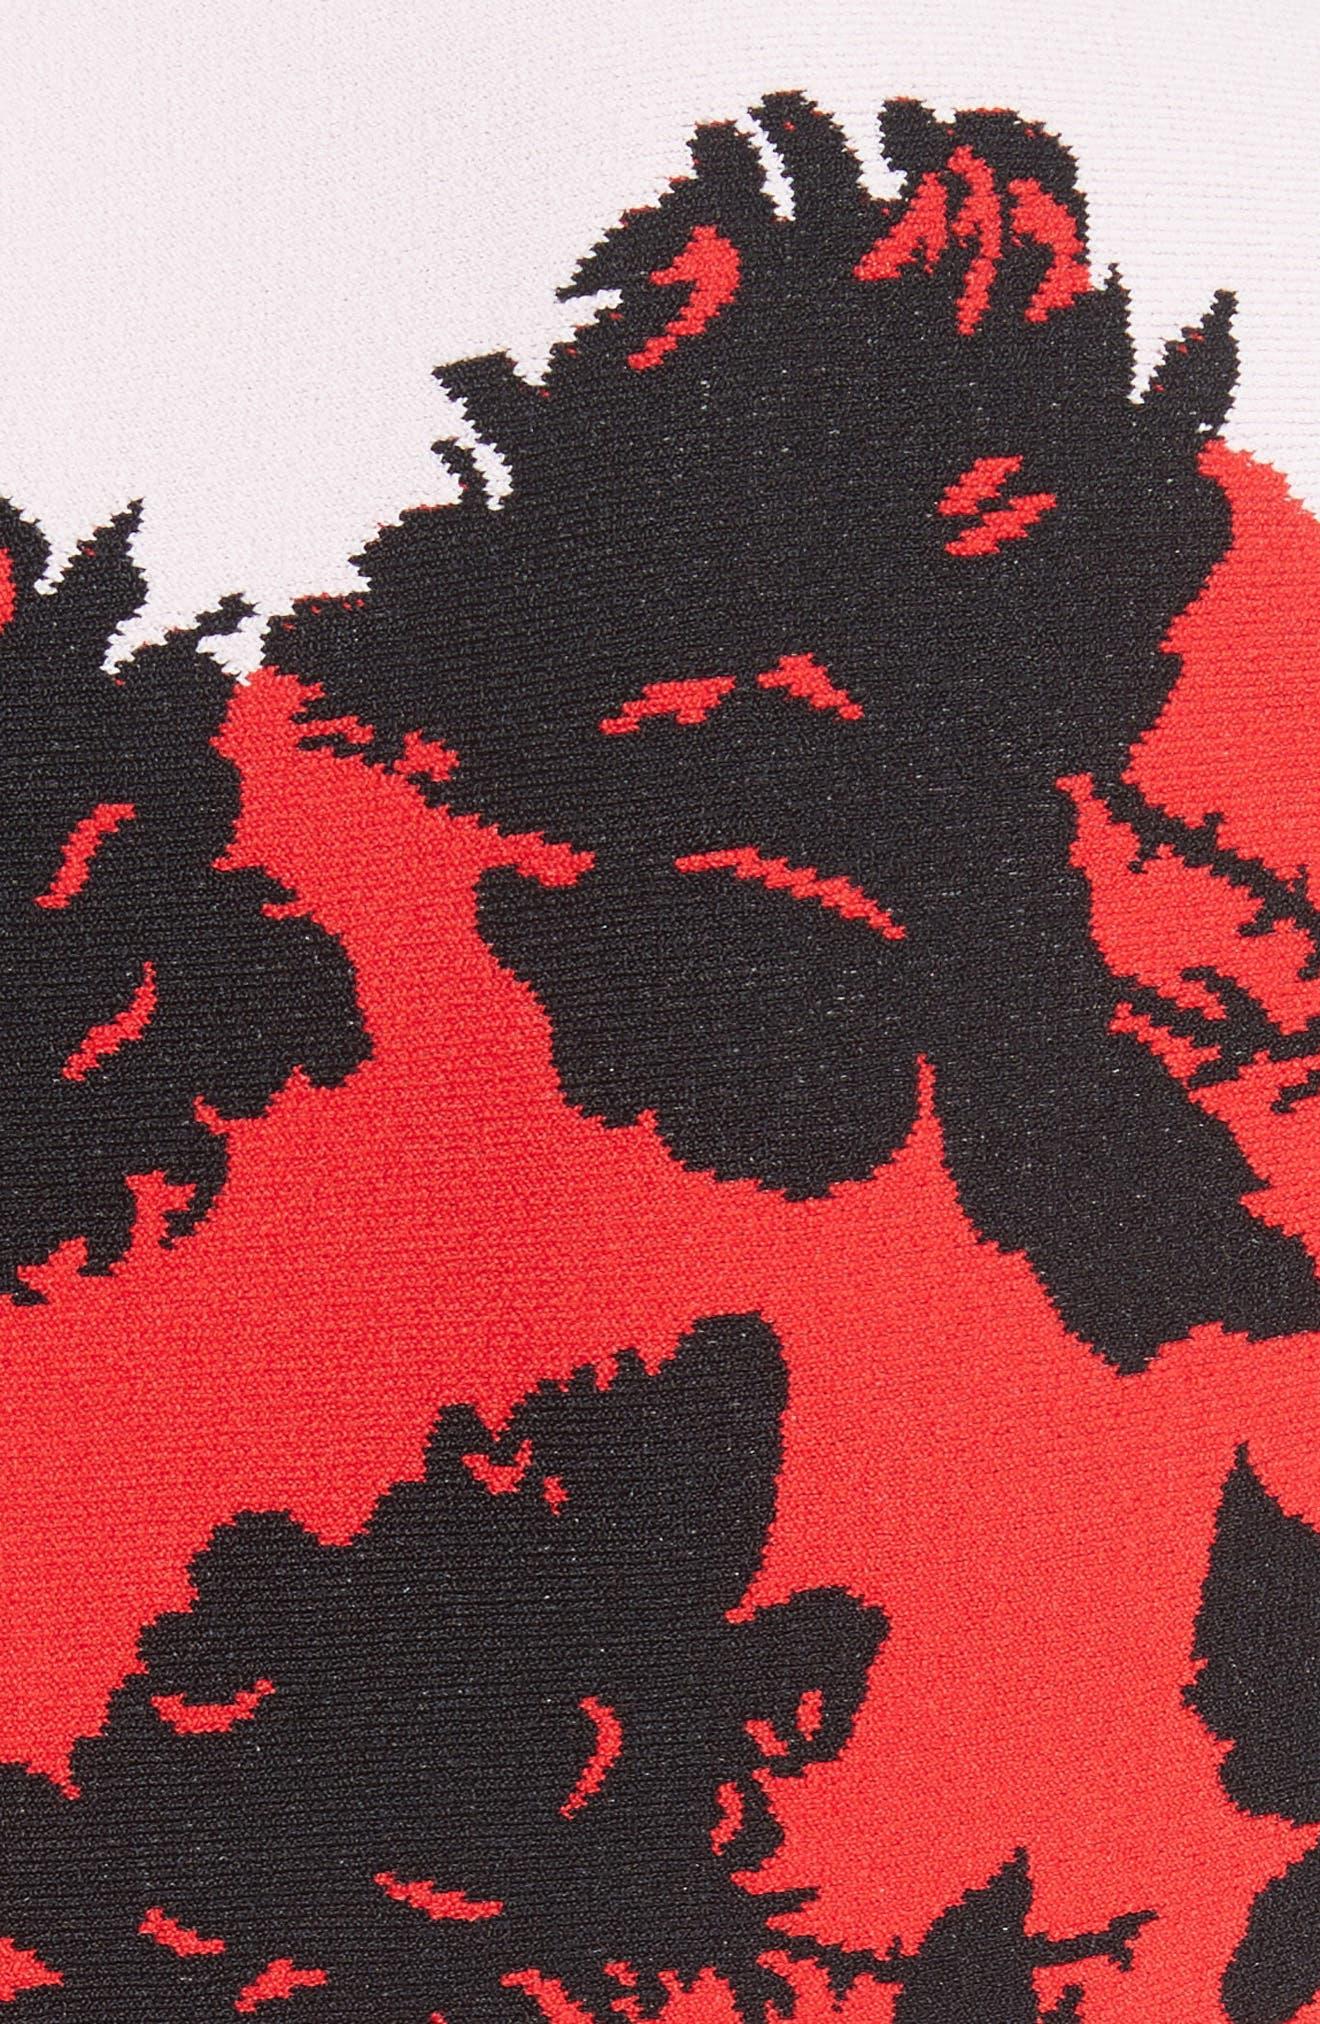 Rose Jacquard Knit Flounce Dress,                             Alternate thumbnail 5, color,                             Red/ Black/ Ivory/ Pink